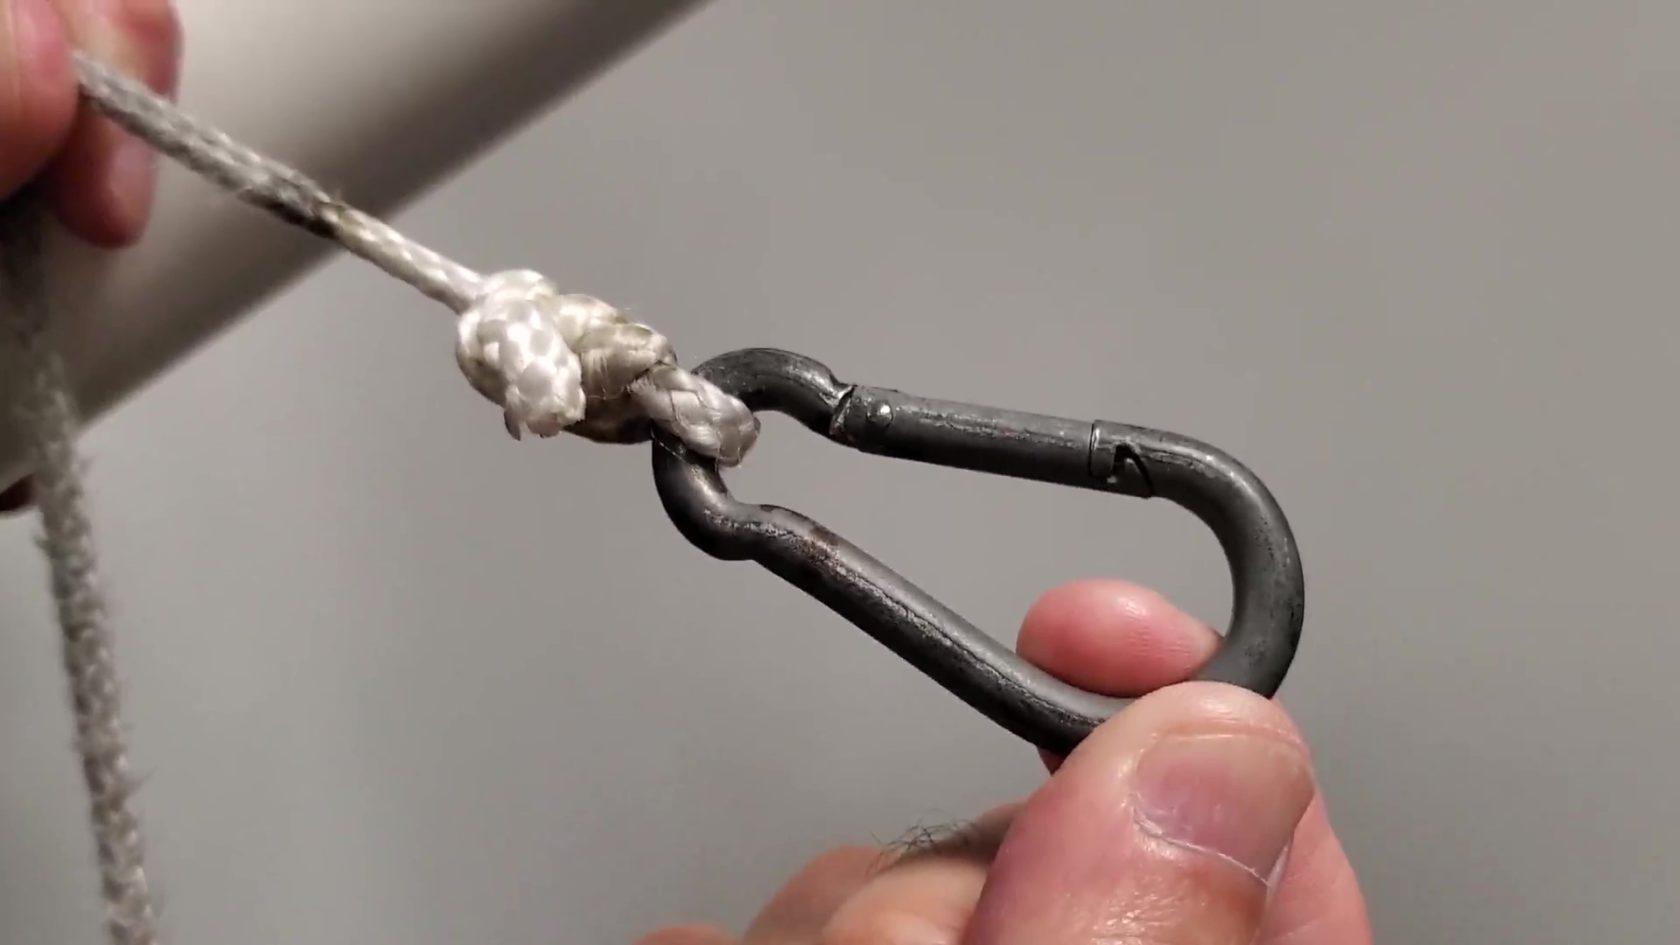 grip strengthening